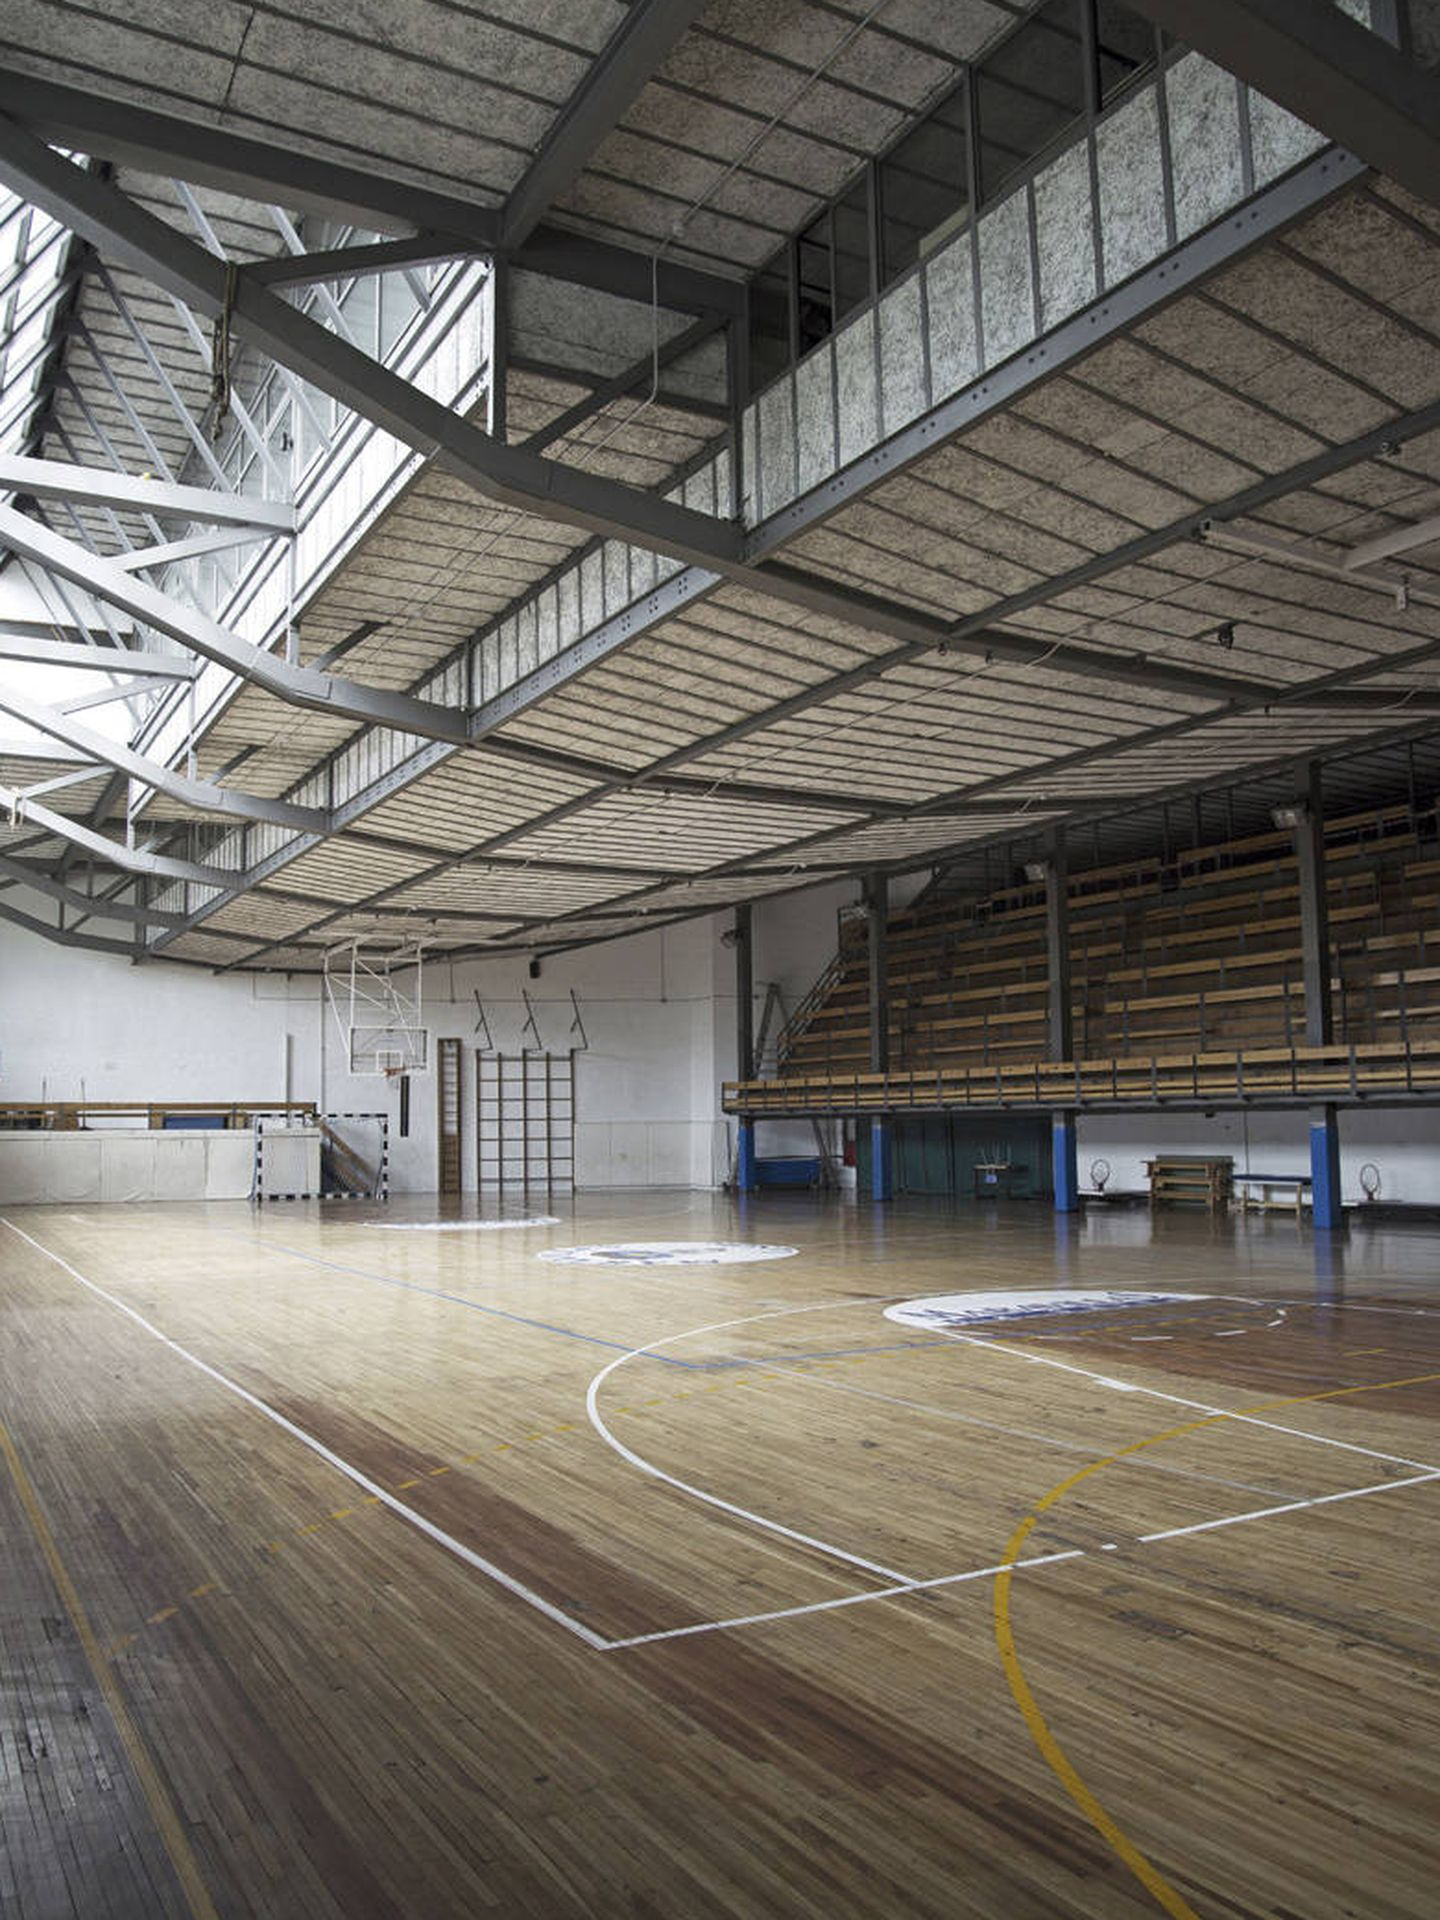 El gimnasio Maravillas. (Foto: COAM)